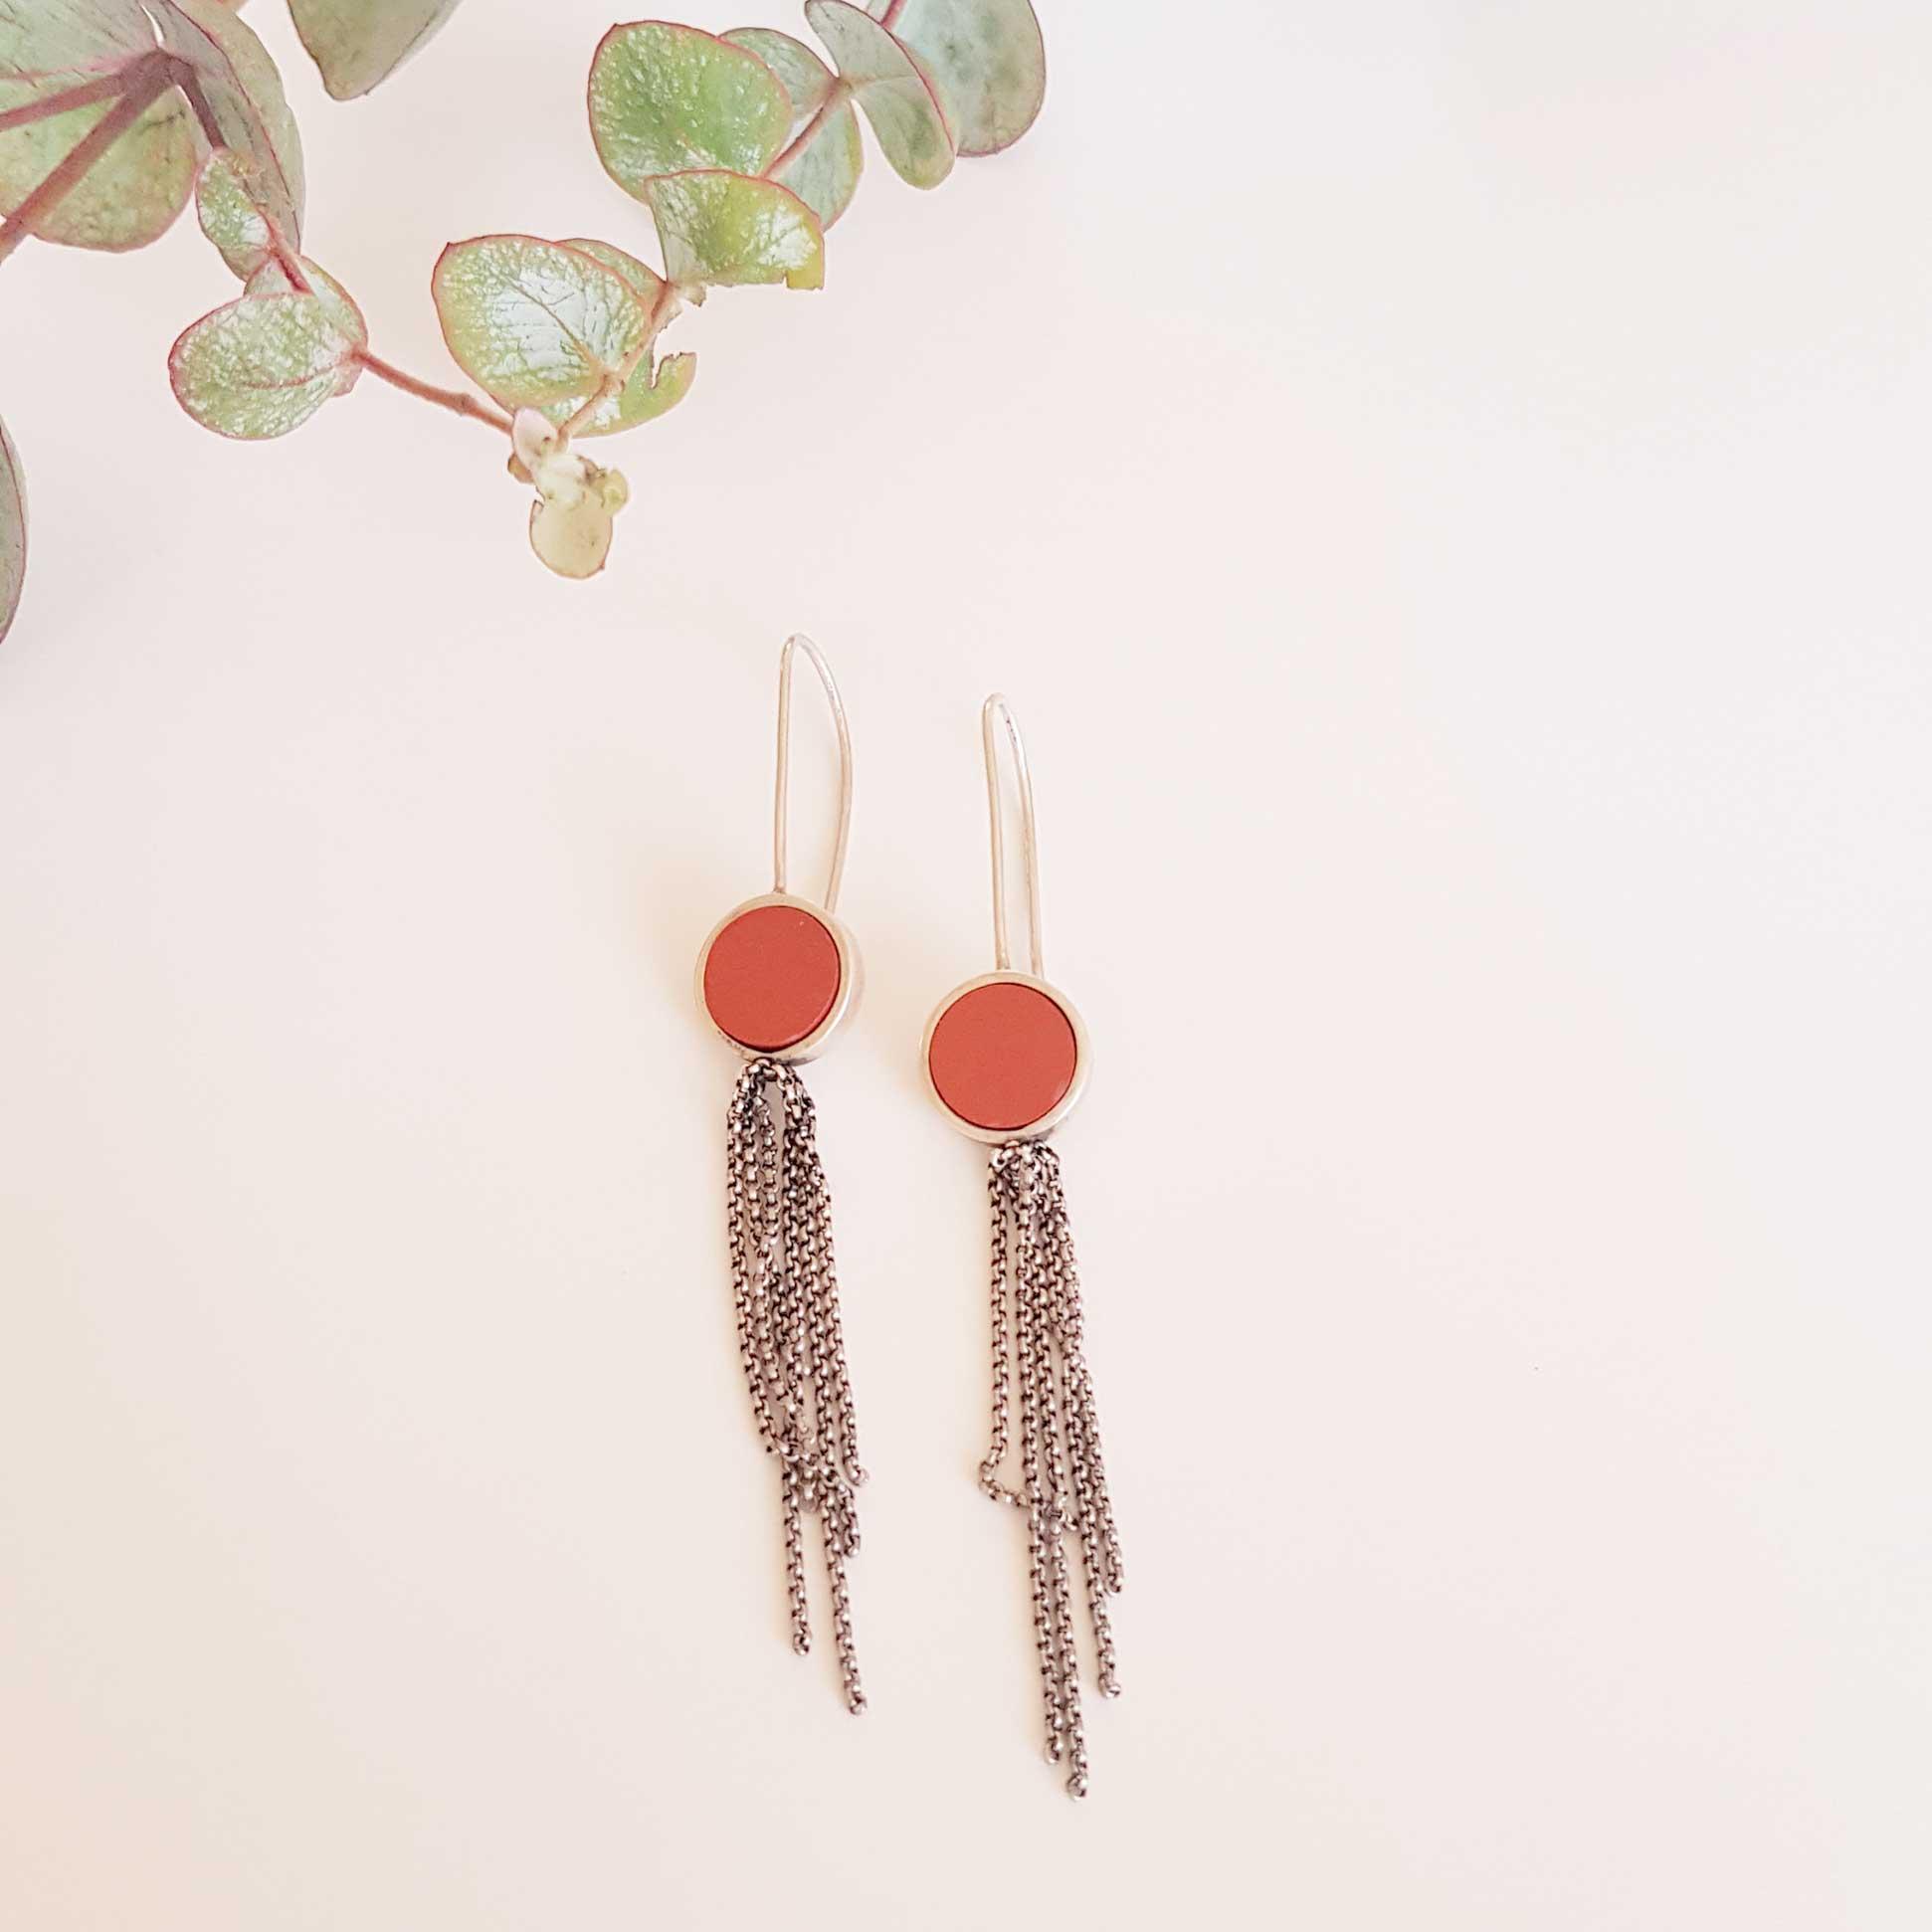 maite-arlaban-artisan-jewelry-aw2018-06